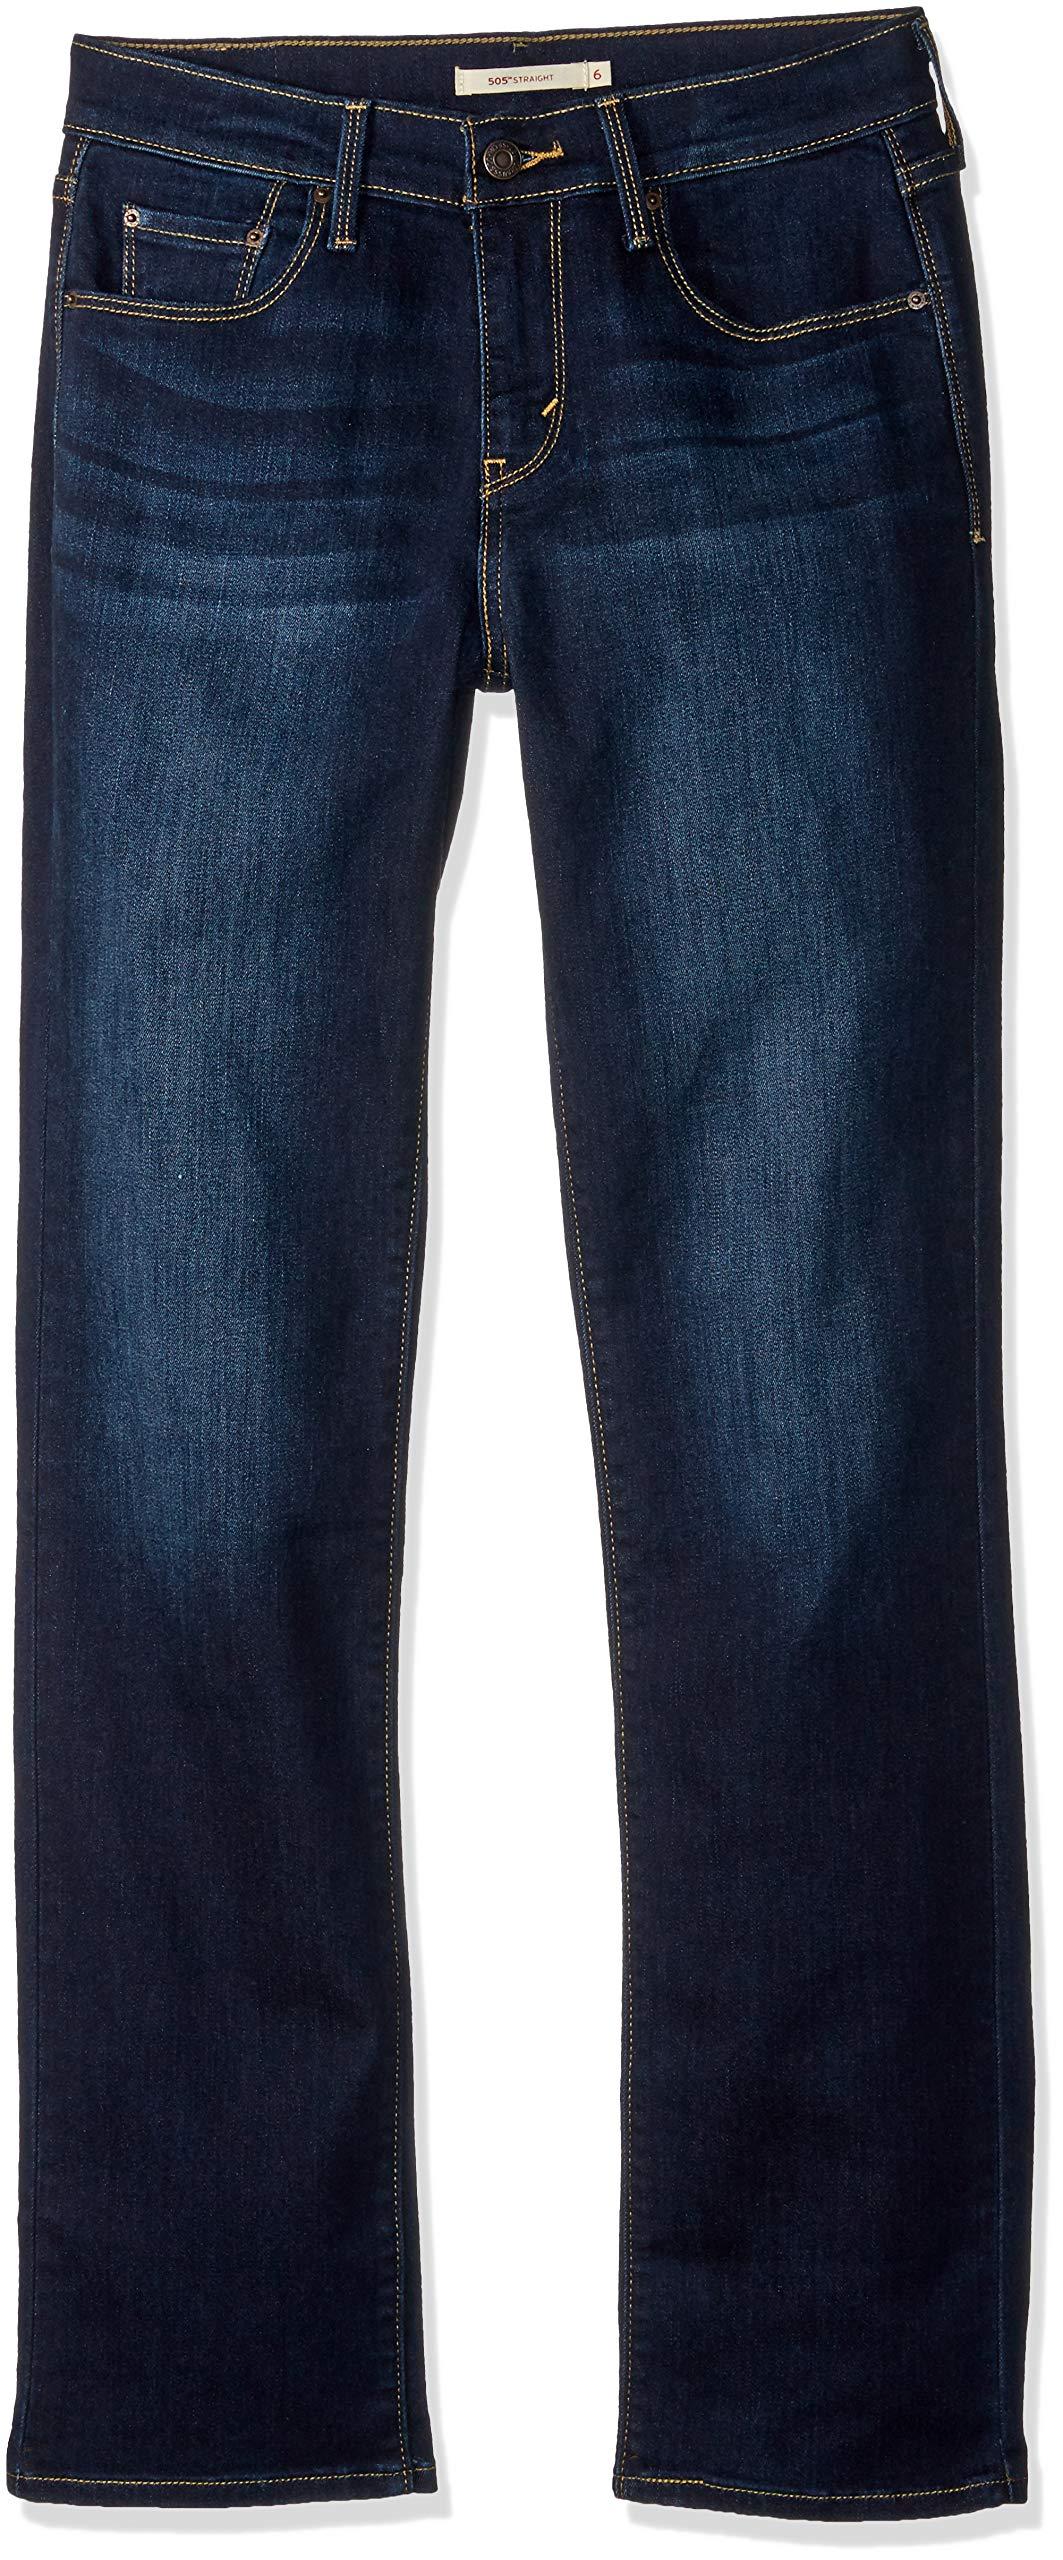 Levi's Women's 505 Straight-Leg Jean, Legacy, 28/6 Medium